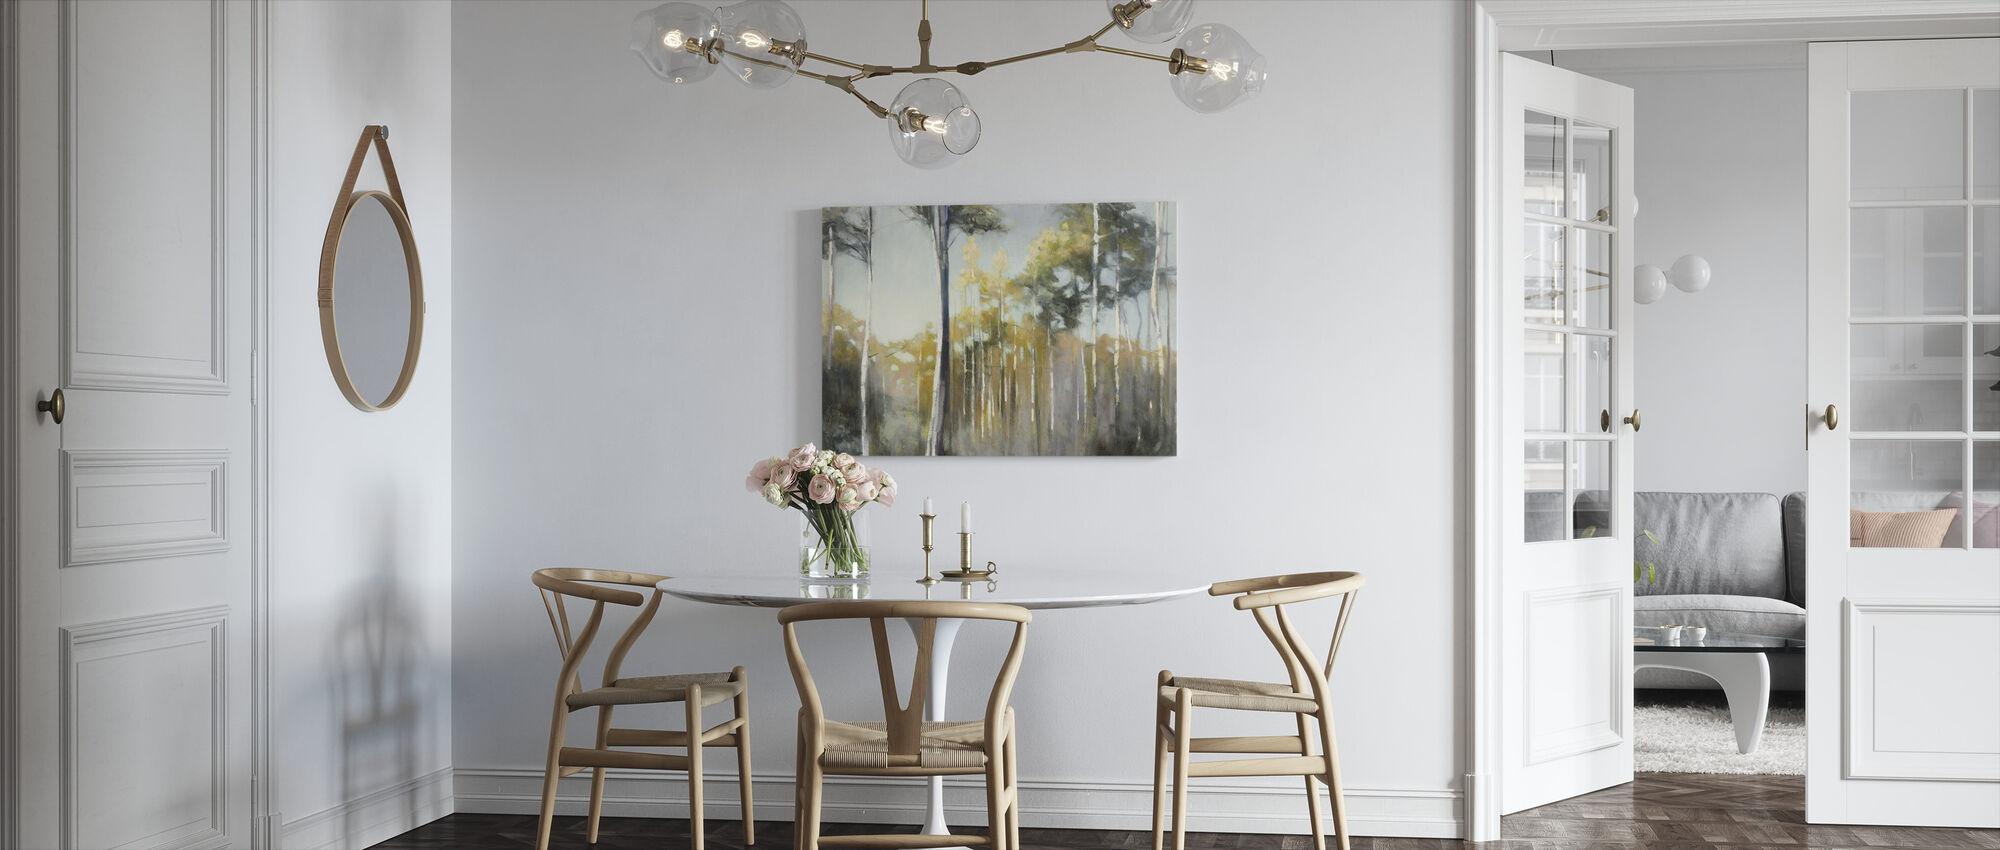 Aspen Reverie - Billede på lærred - Køkken